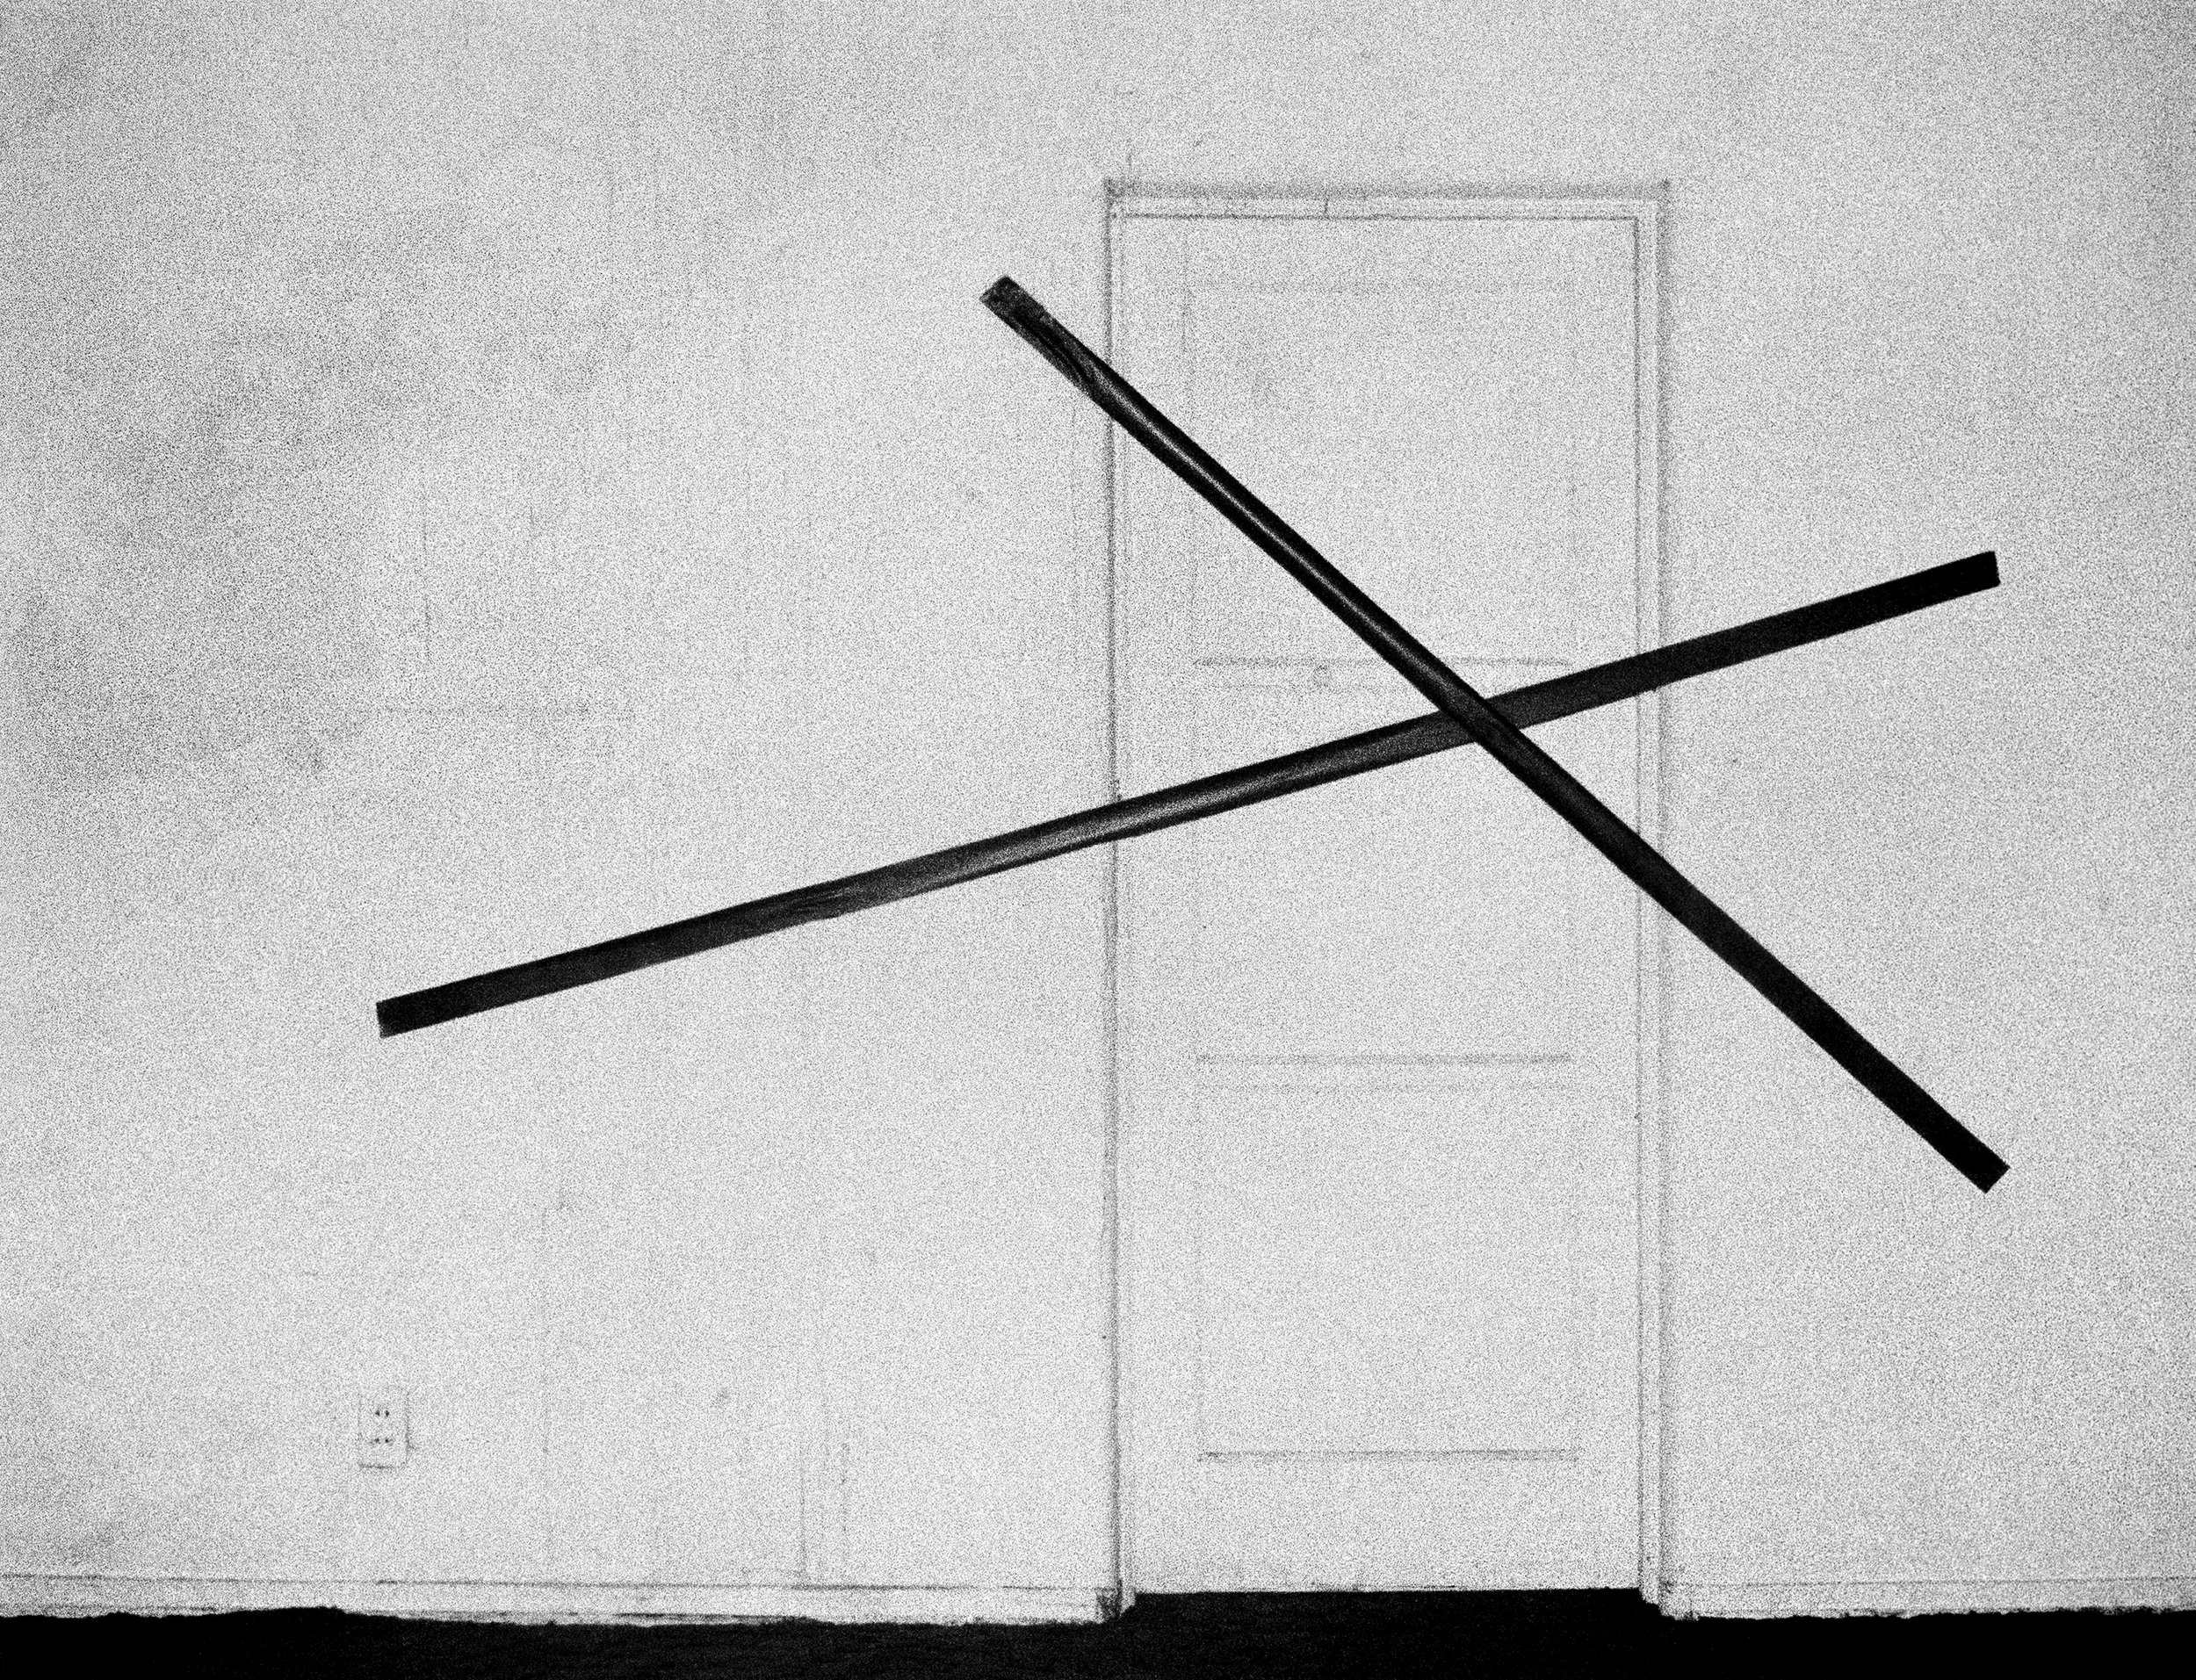 The Hollywood Suites (Bound Doors) #9,  1976  ©  Steve Kahn